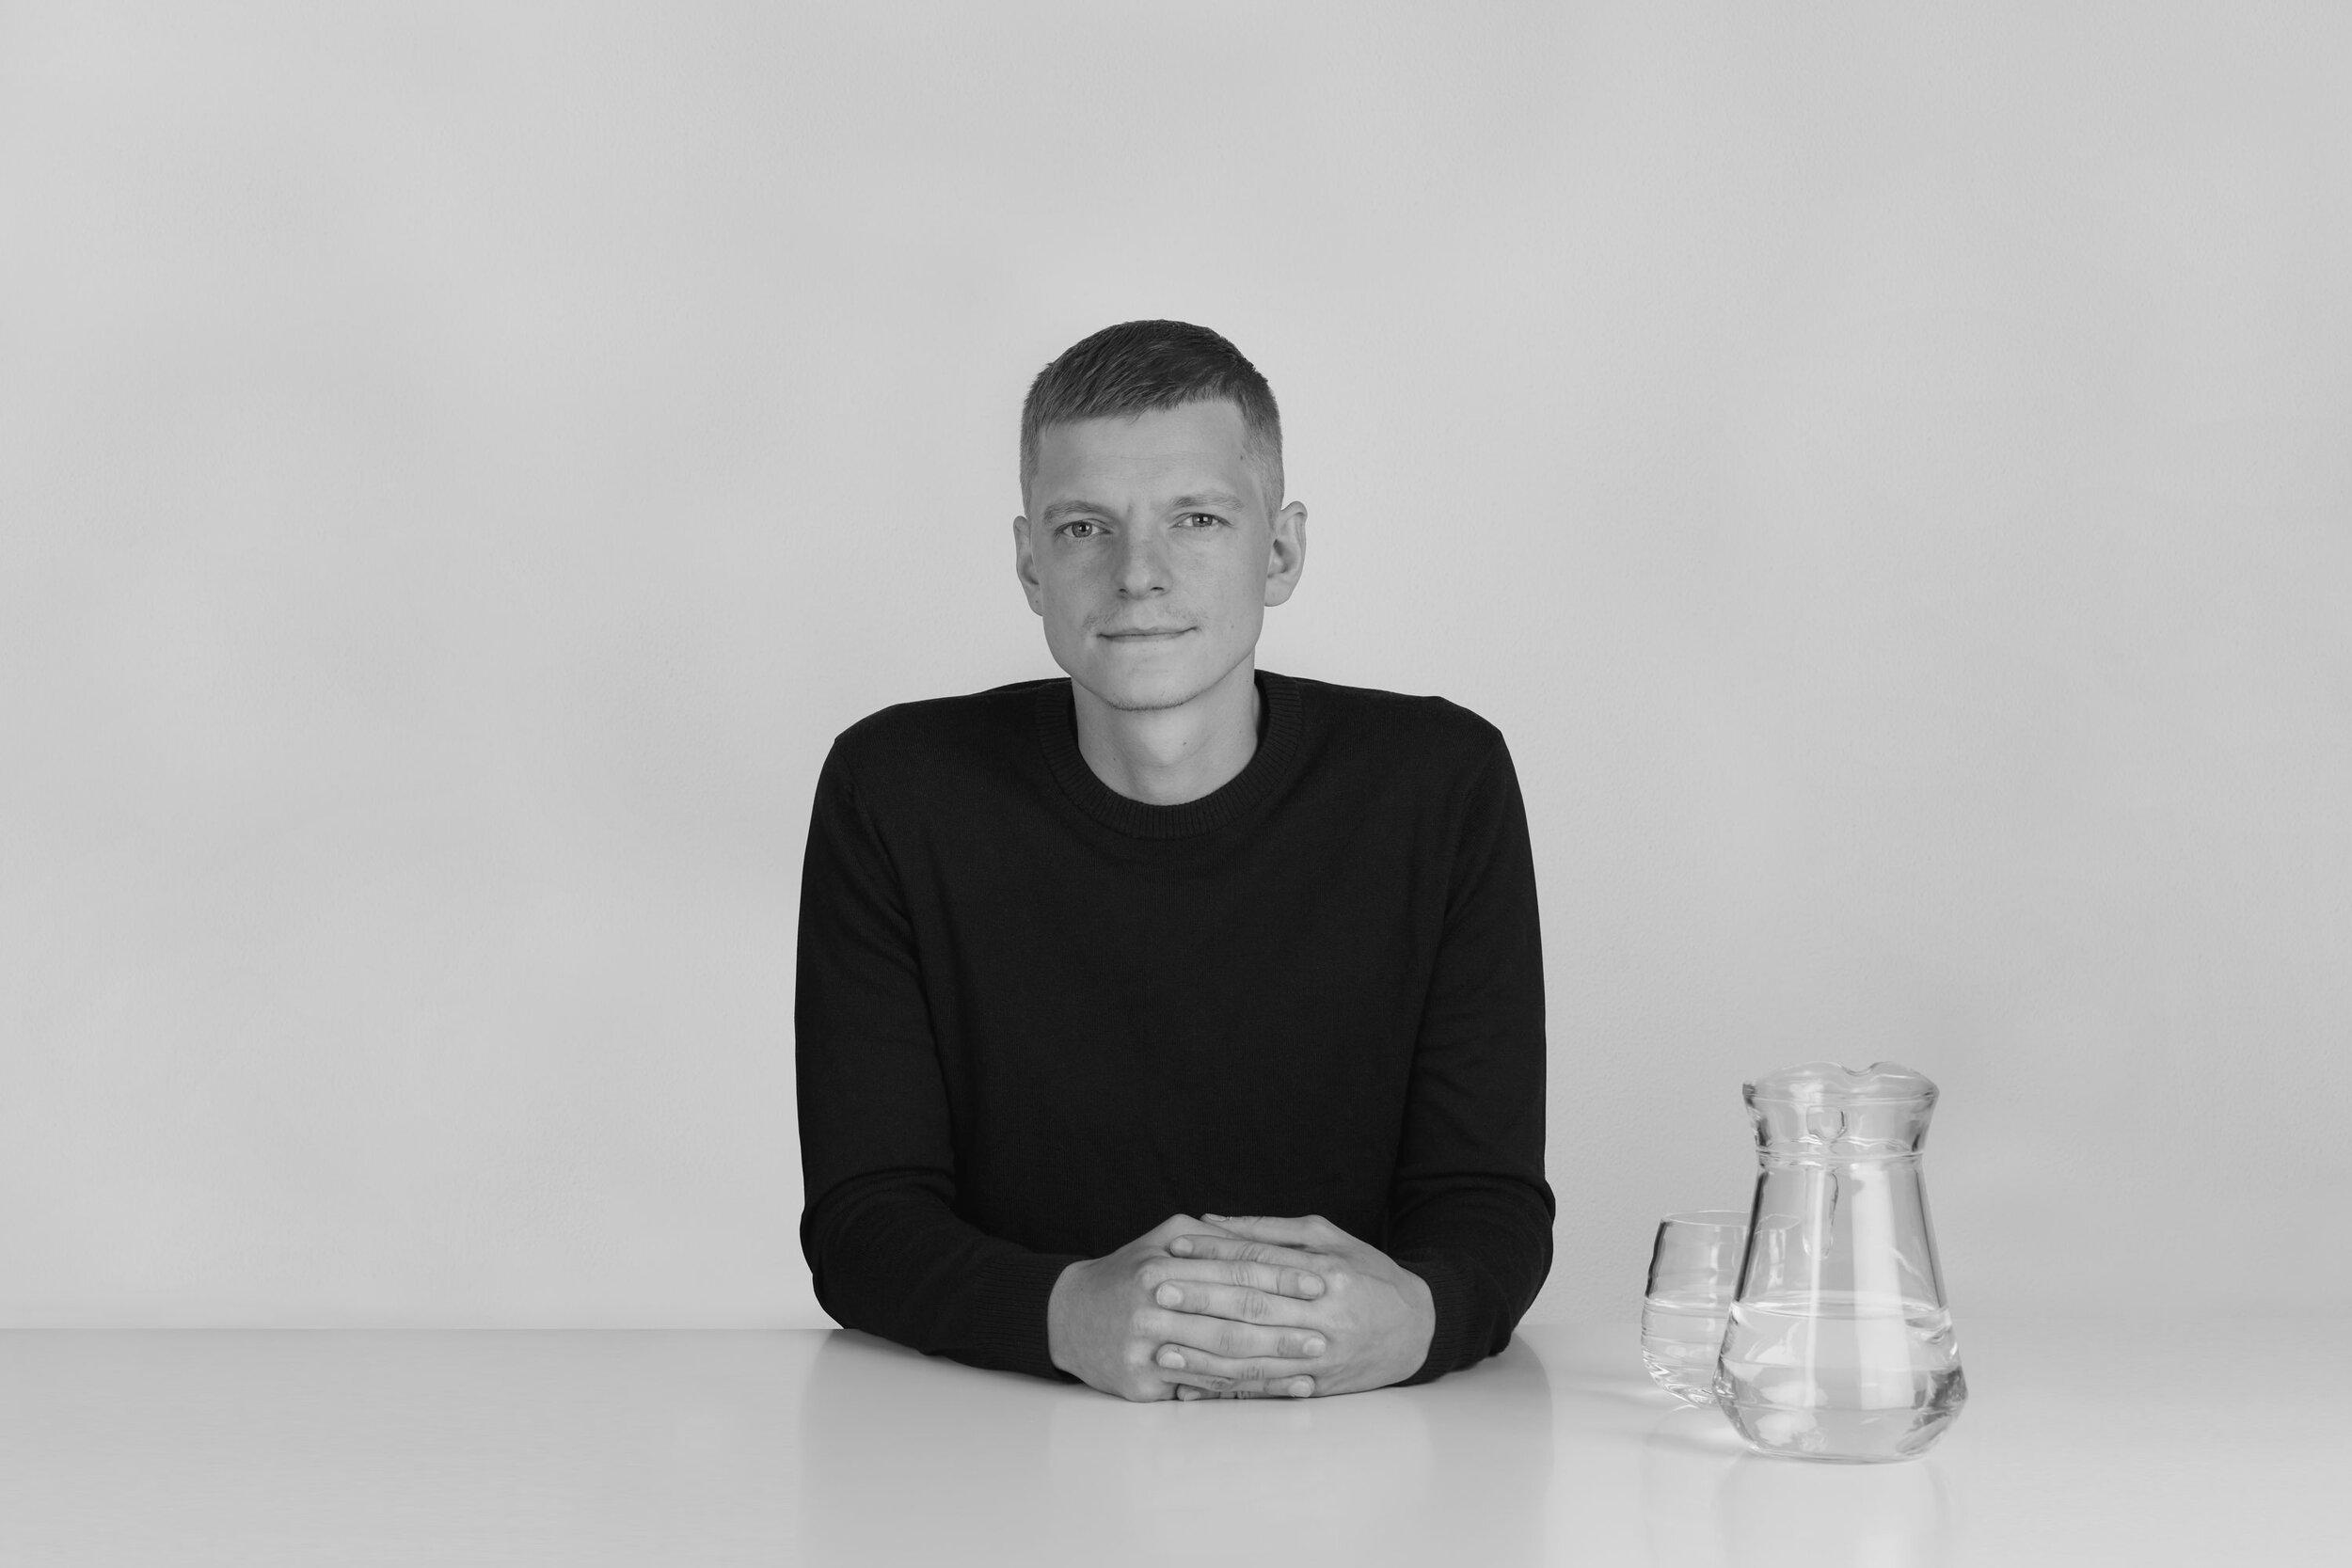 Alexander Brunsø - CEO, M.A.